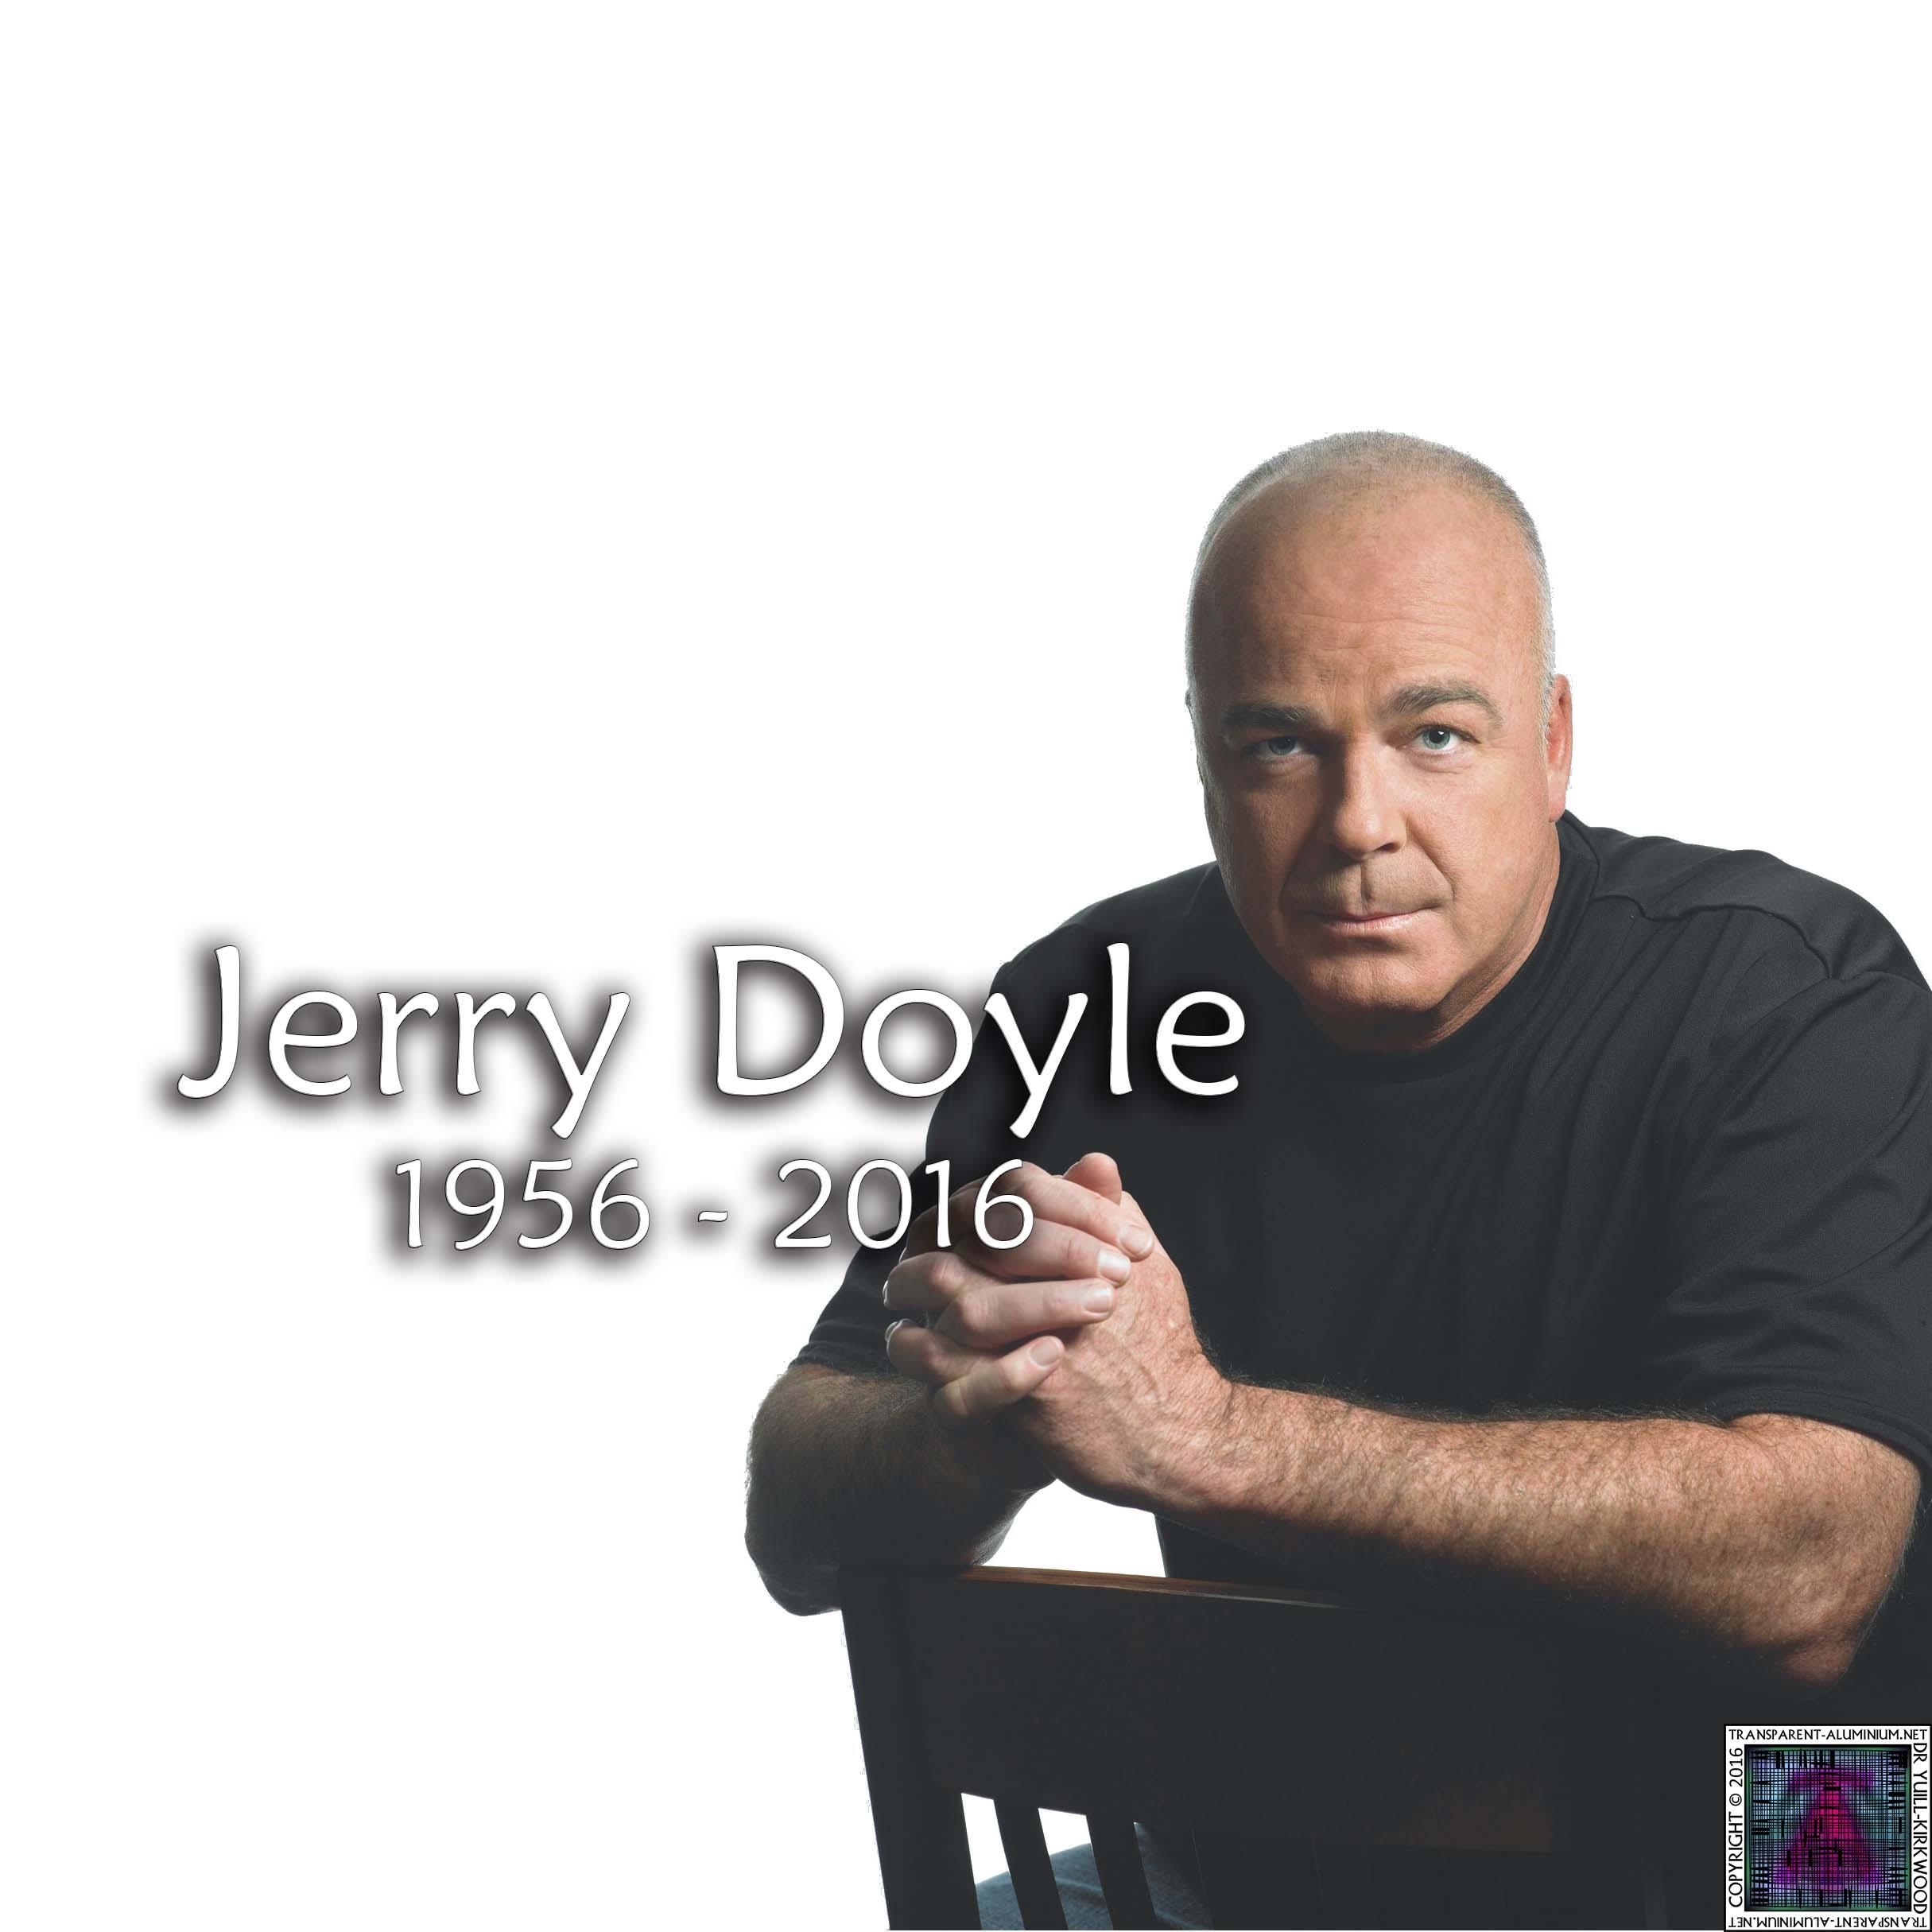 Jerry Doyle 1956-2016 (2)